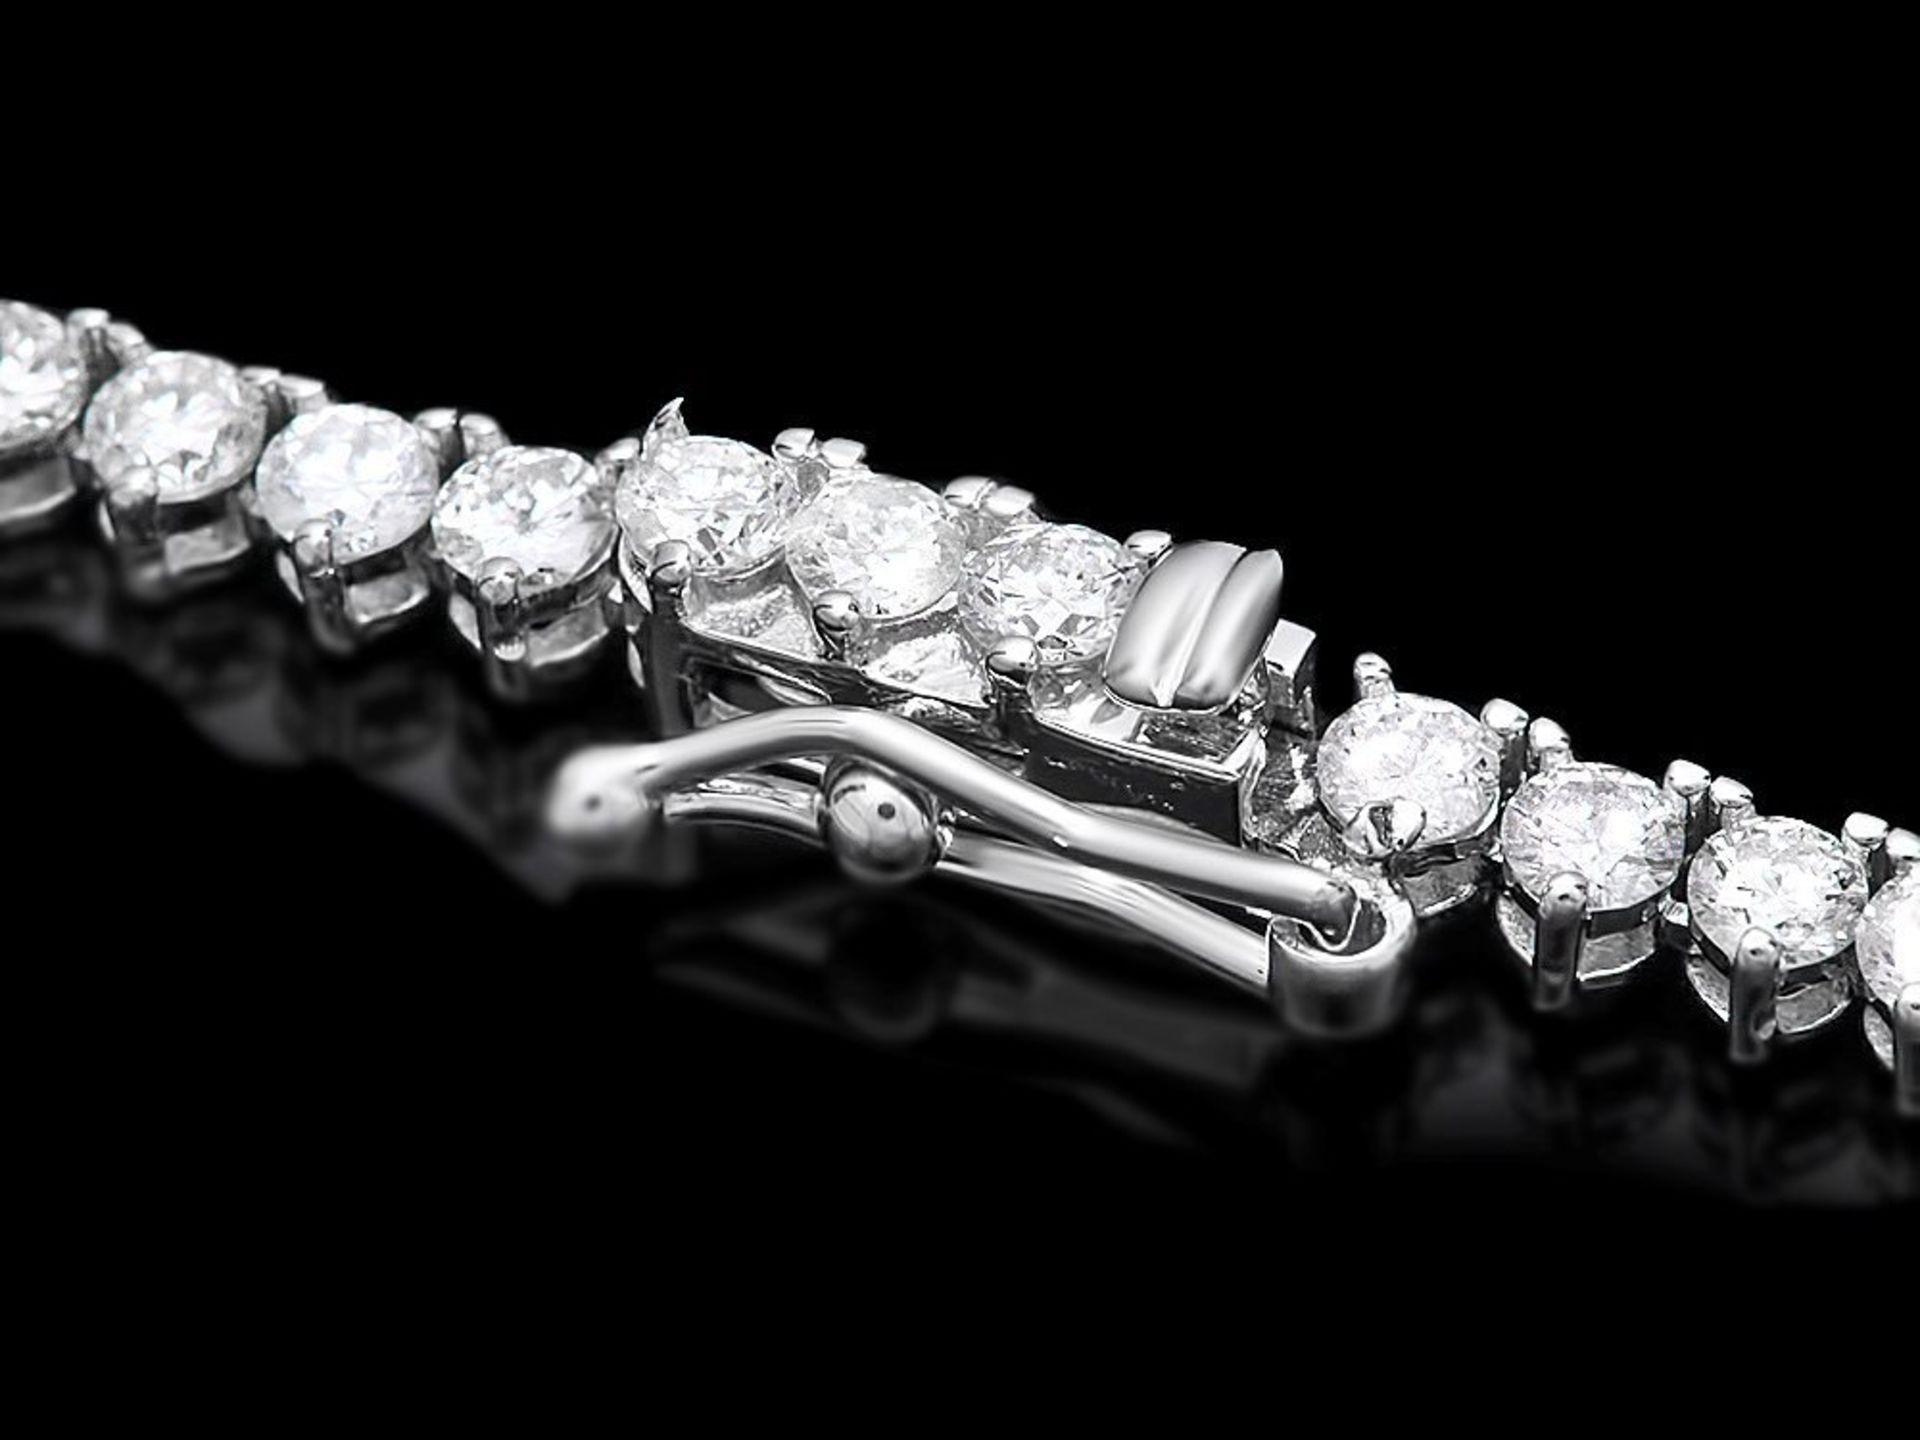 18k White Gold 9.00ct Diamond Necklace - Image 4 of 5